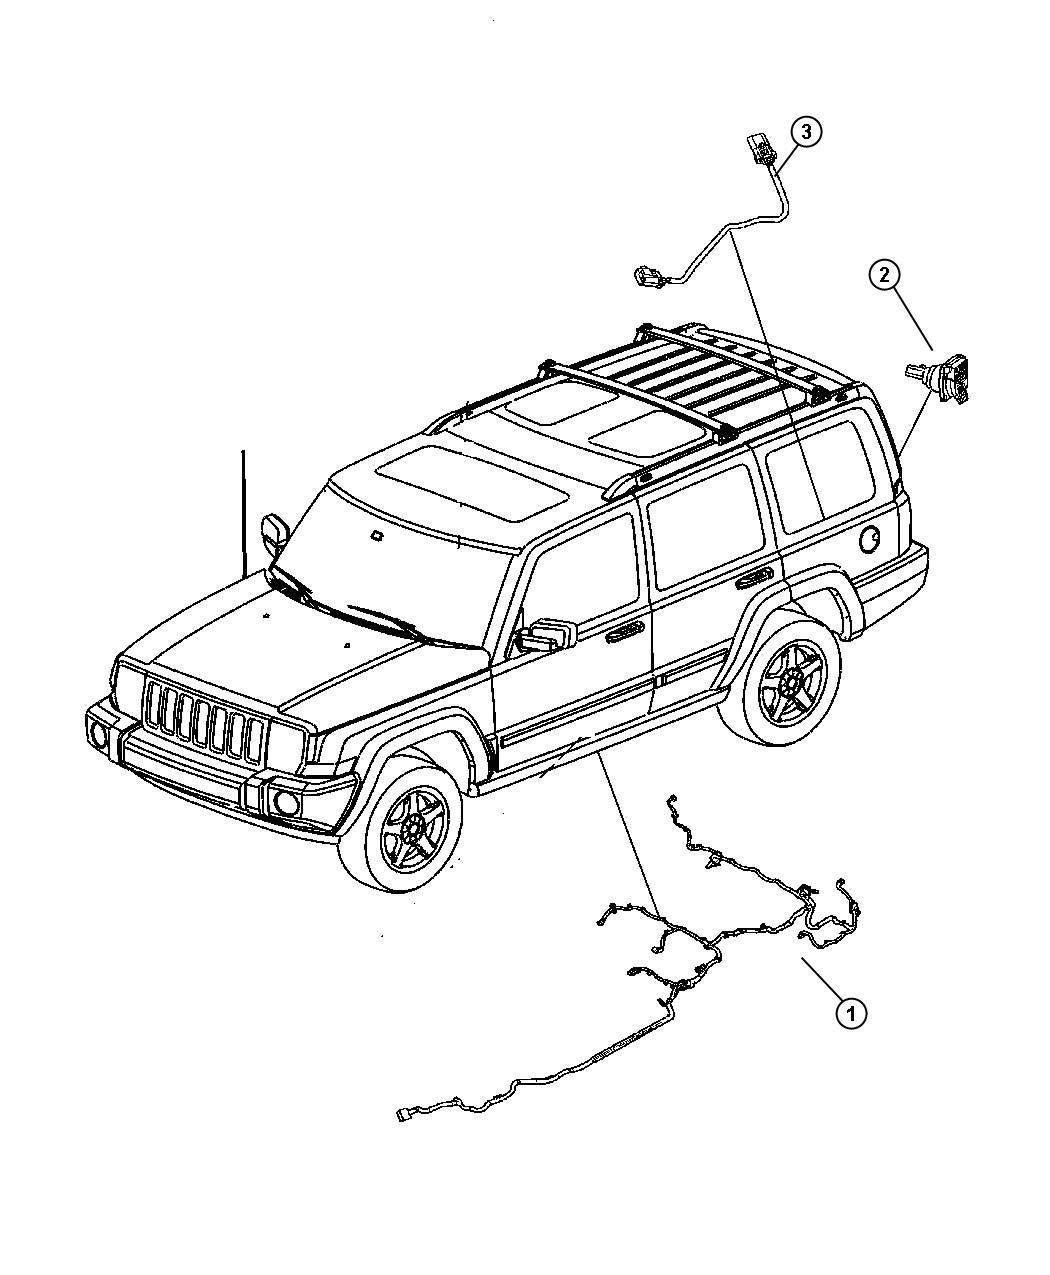 Jeep Commander Wiring. Fuel module. Groupfuel, vehiclefuel